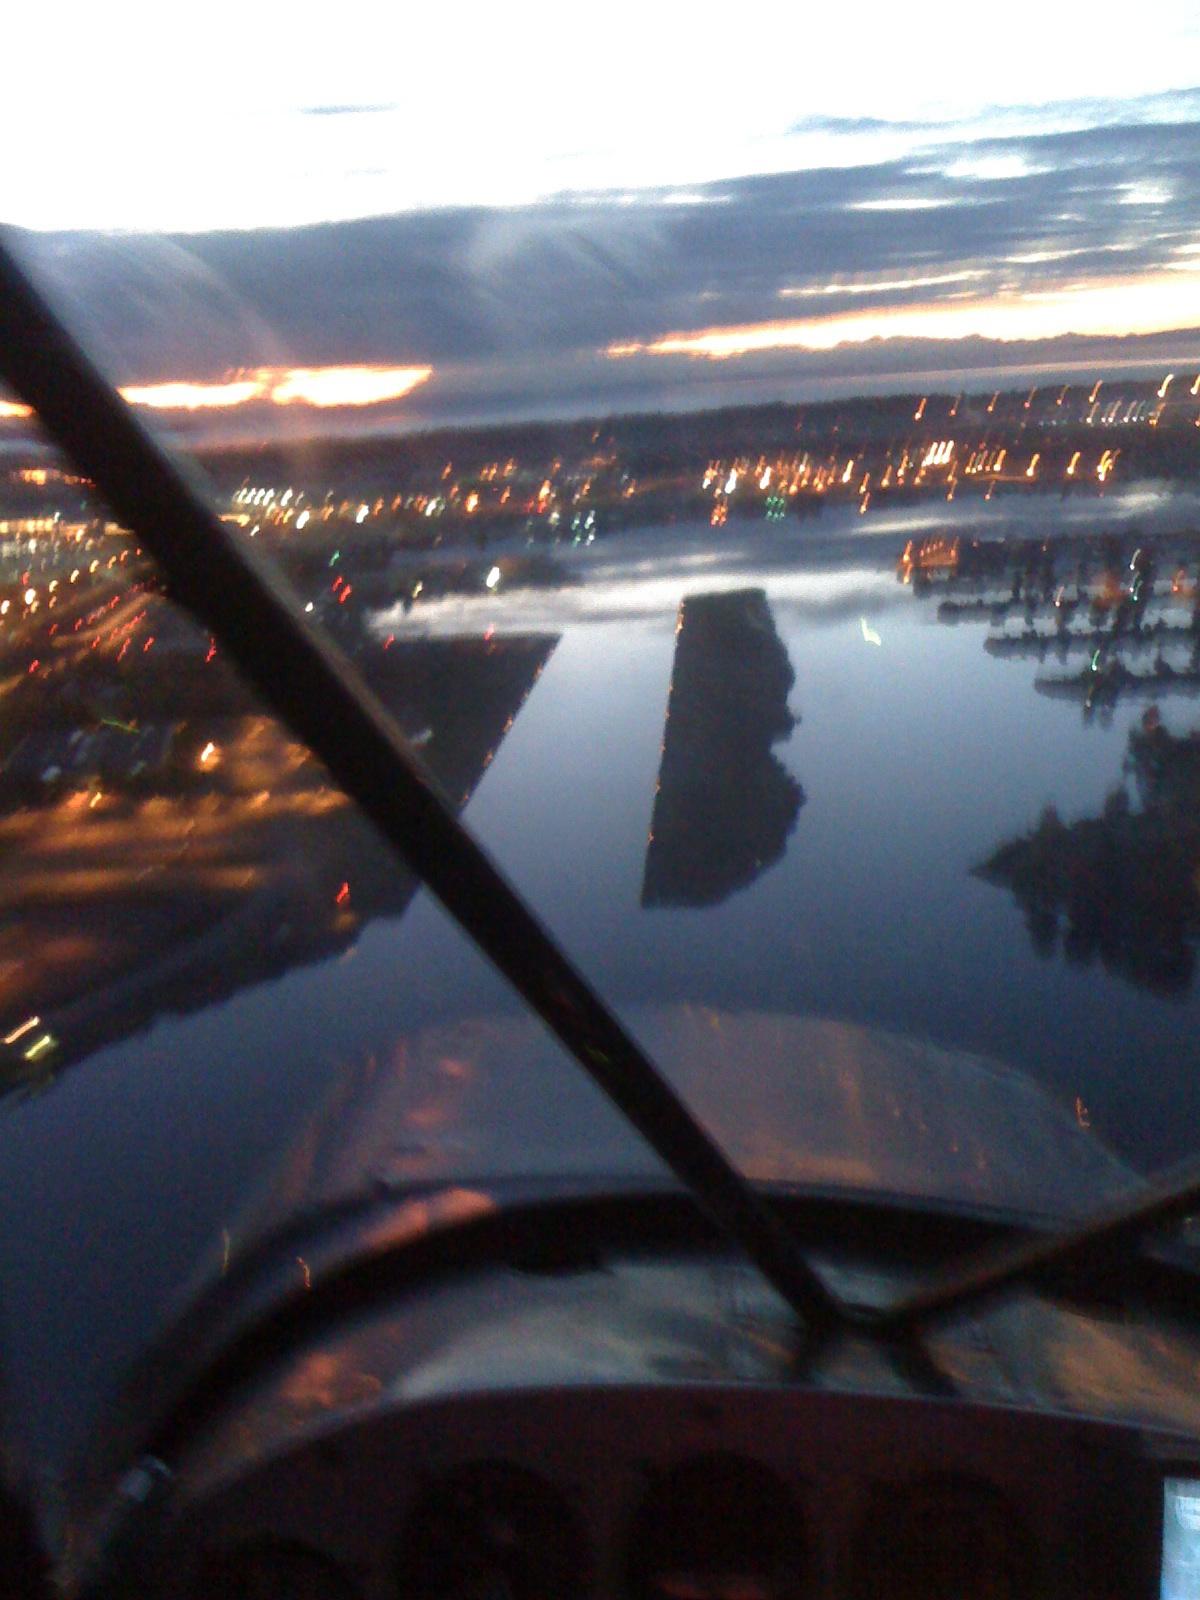 Flight school at lake hood float ratings super cub tail wheel